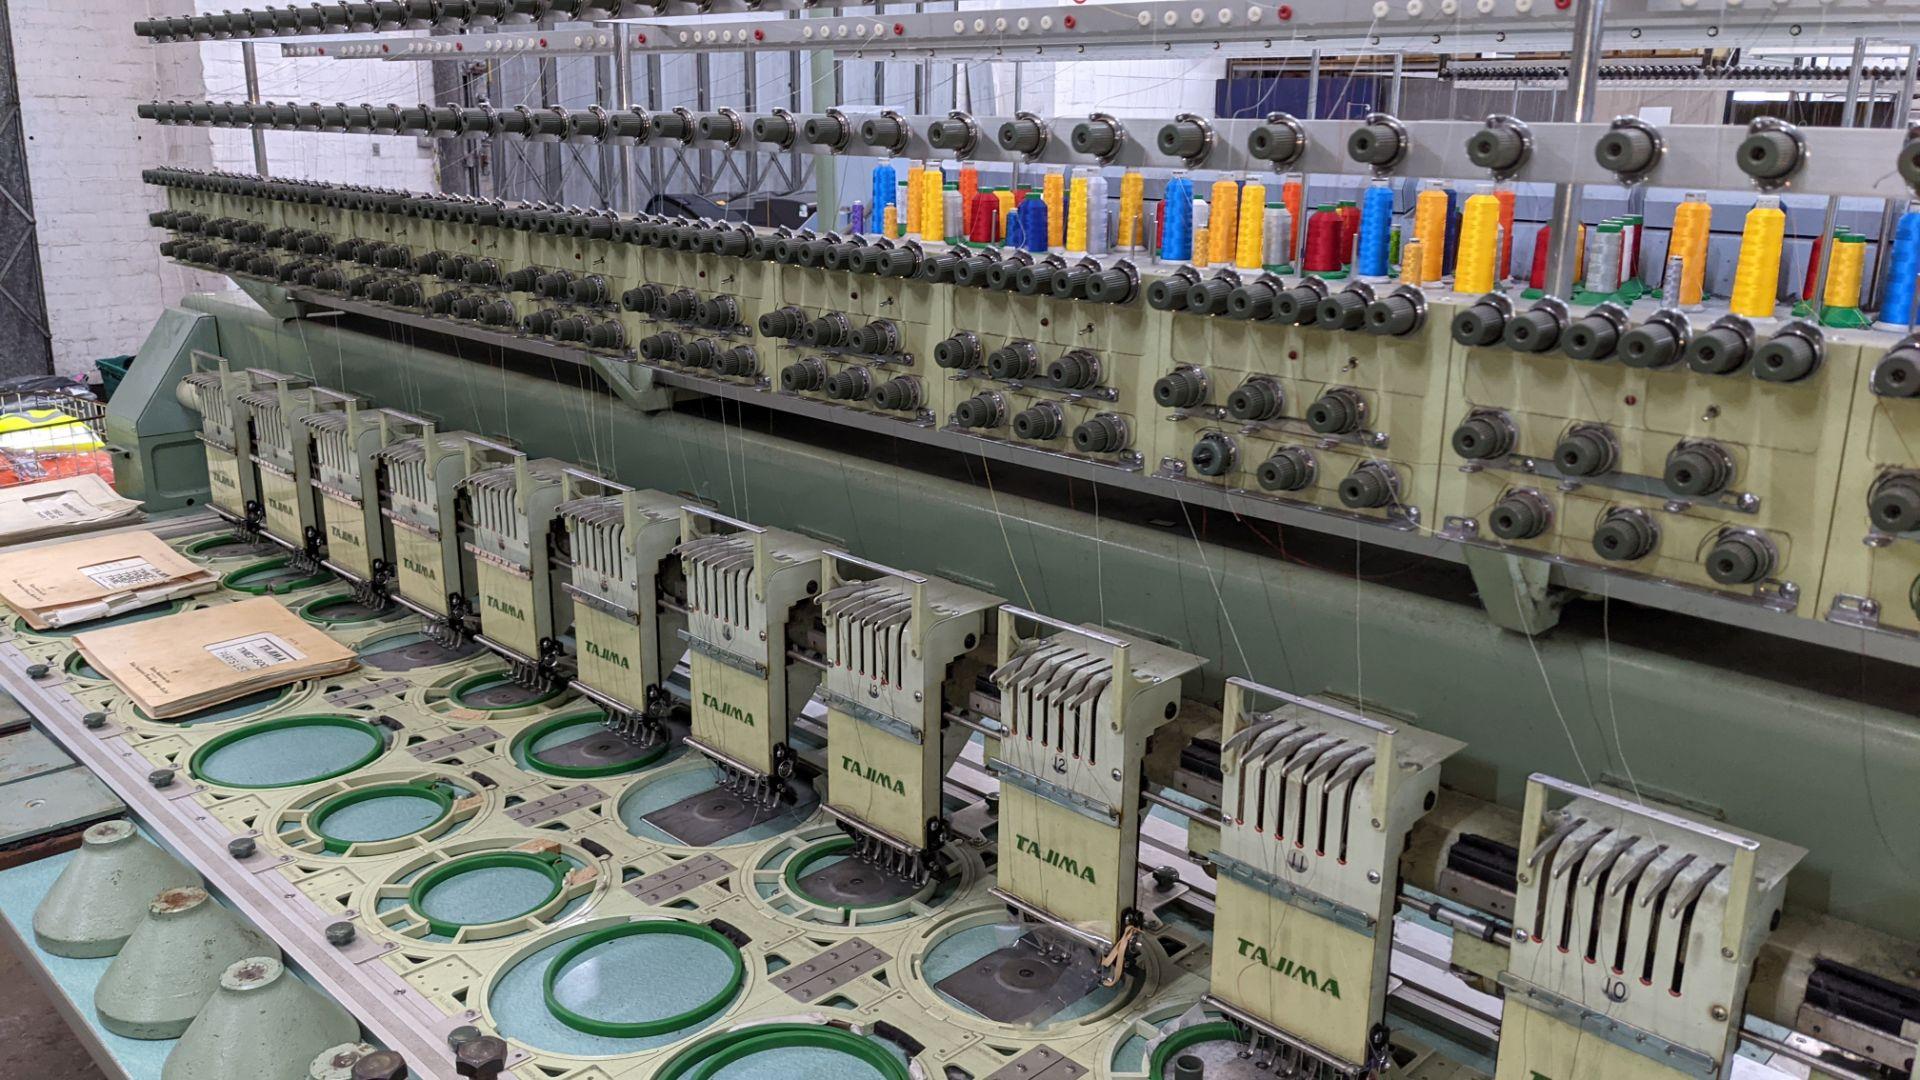 Tokai Tajima electronic 20 head automatic embroidery machine model TMEF-H620 - Image 9 of 25